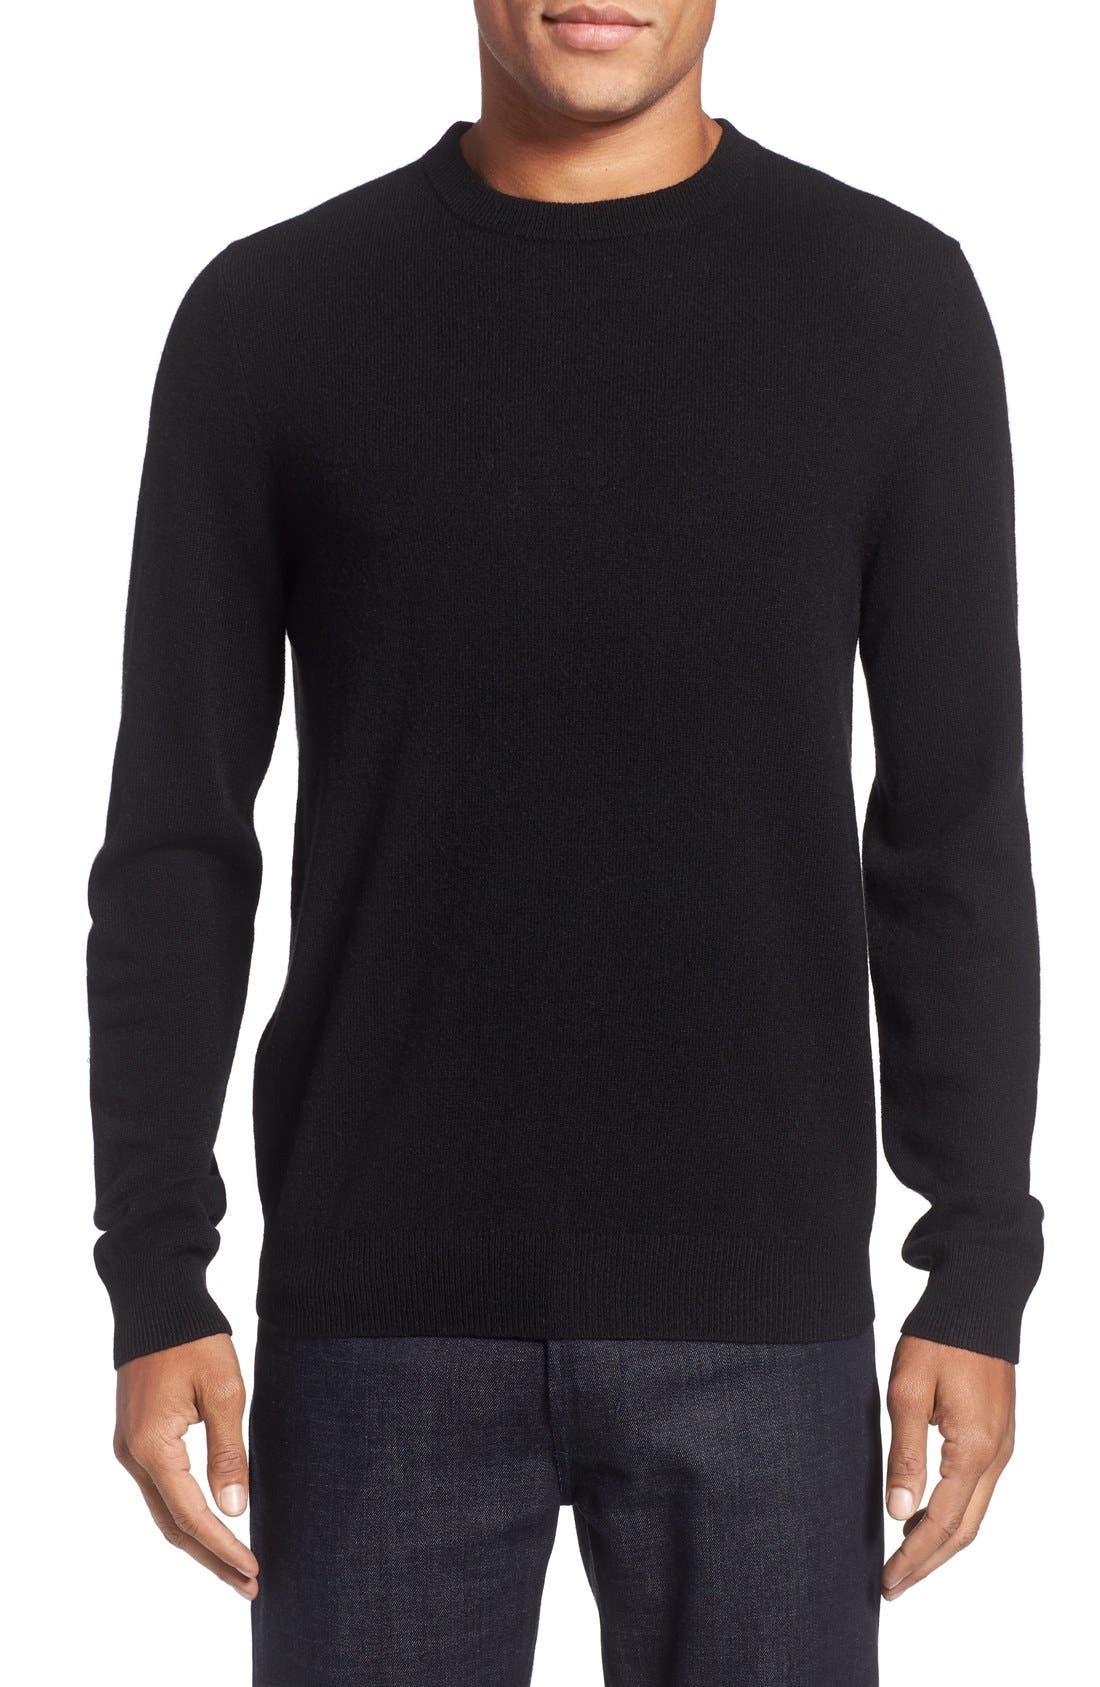 Cashmere Crewneck Sweater,                             Main thumbnail 1, color,                             BLACK CAVIAR